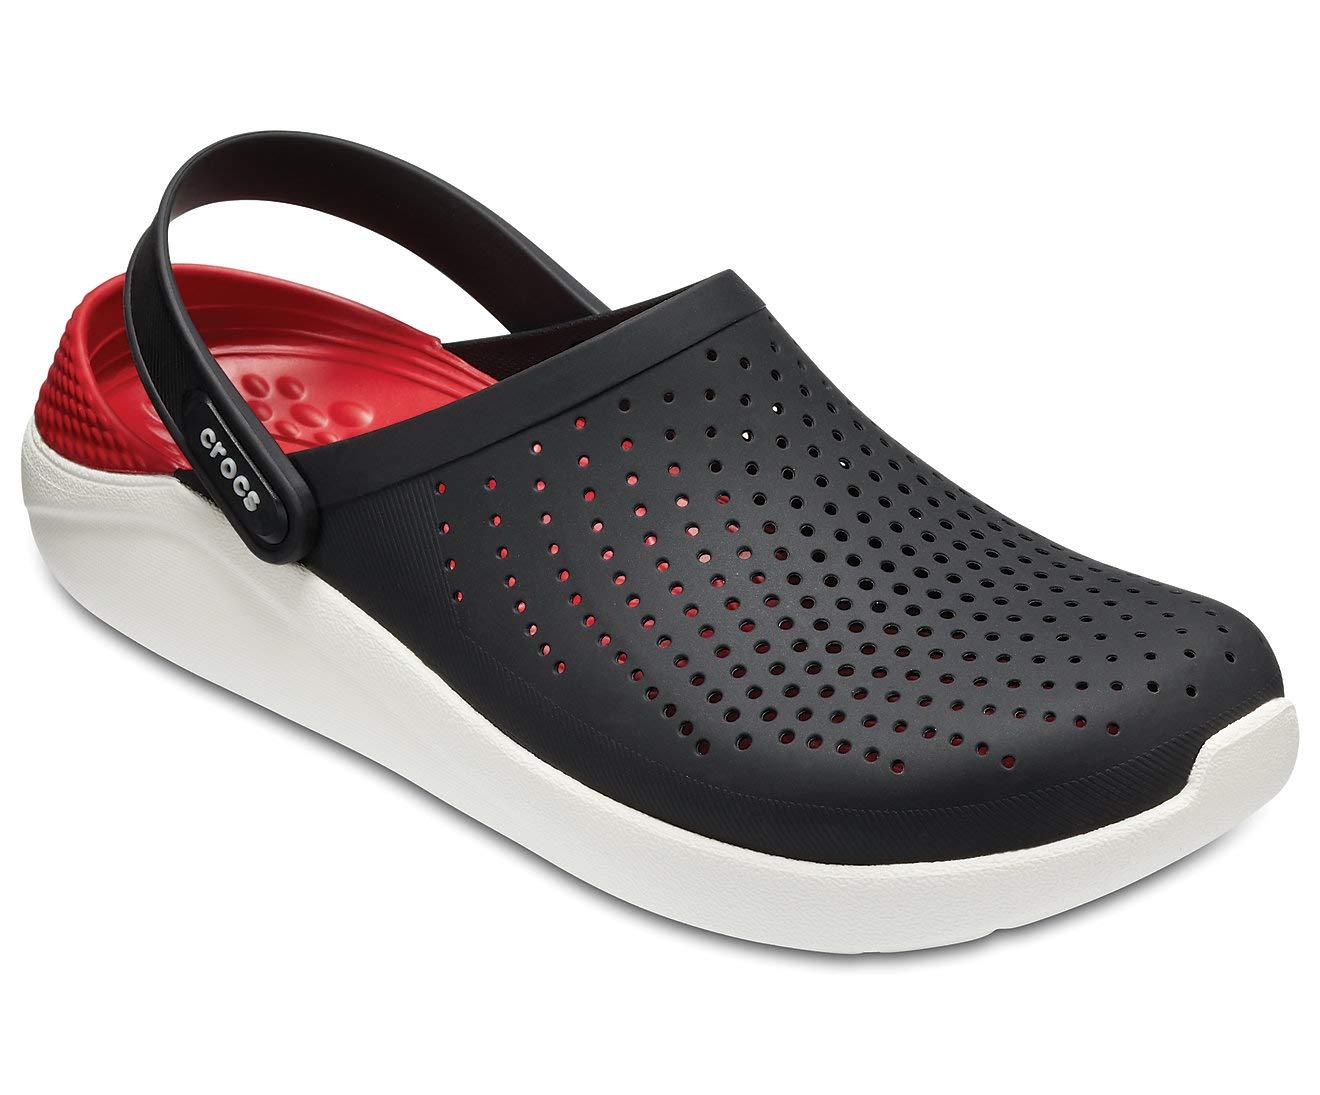 LiteRide Clog, Casual Athletic Shoe